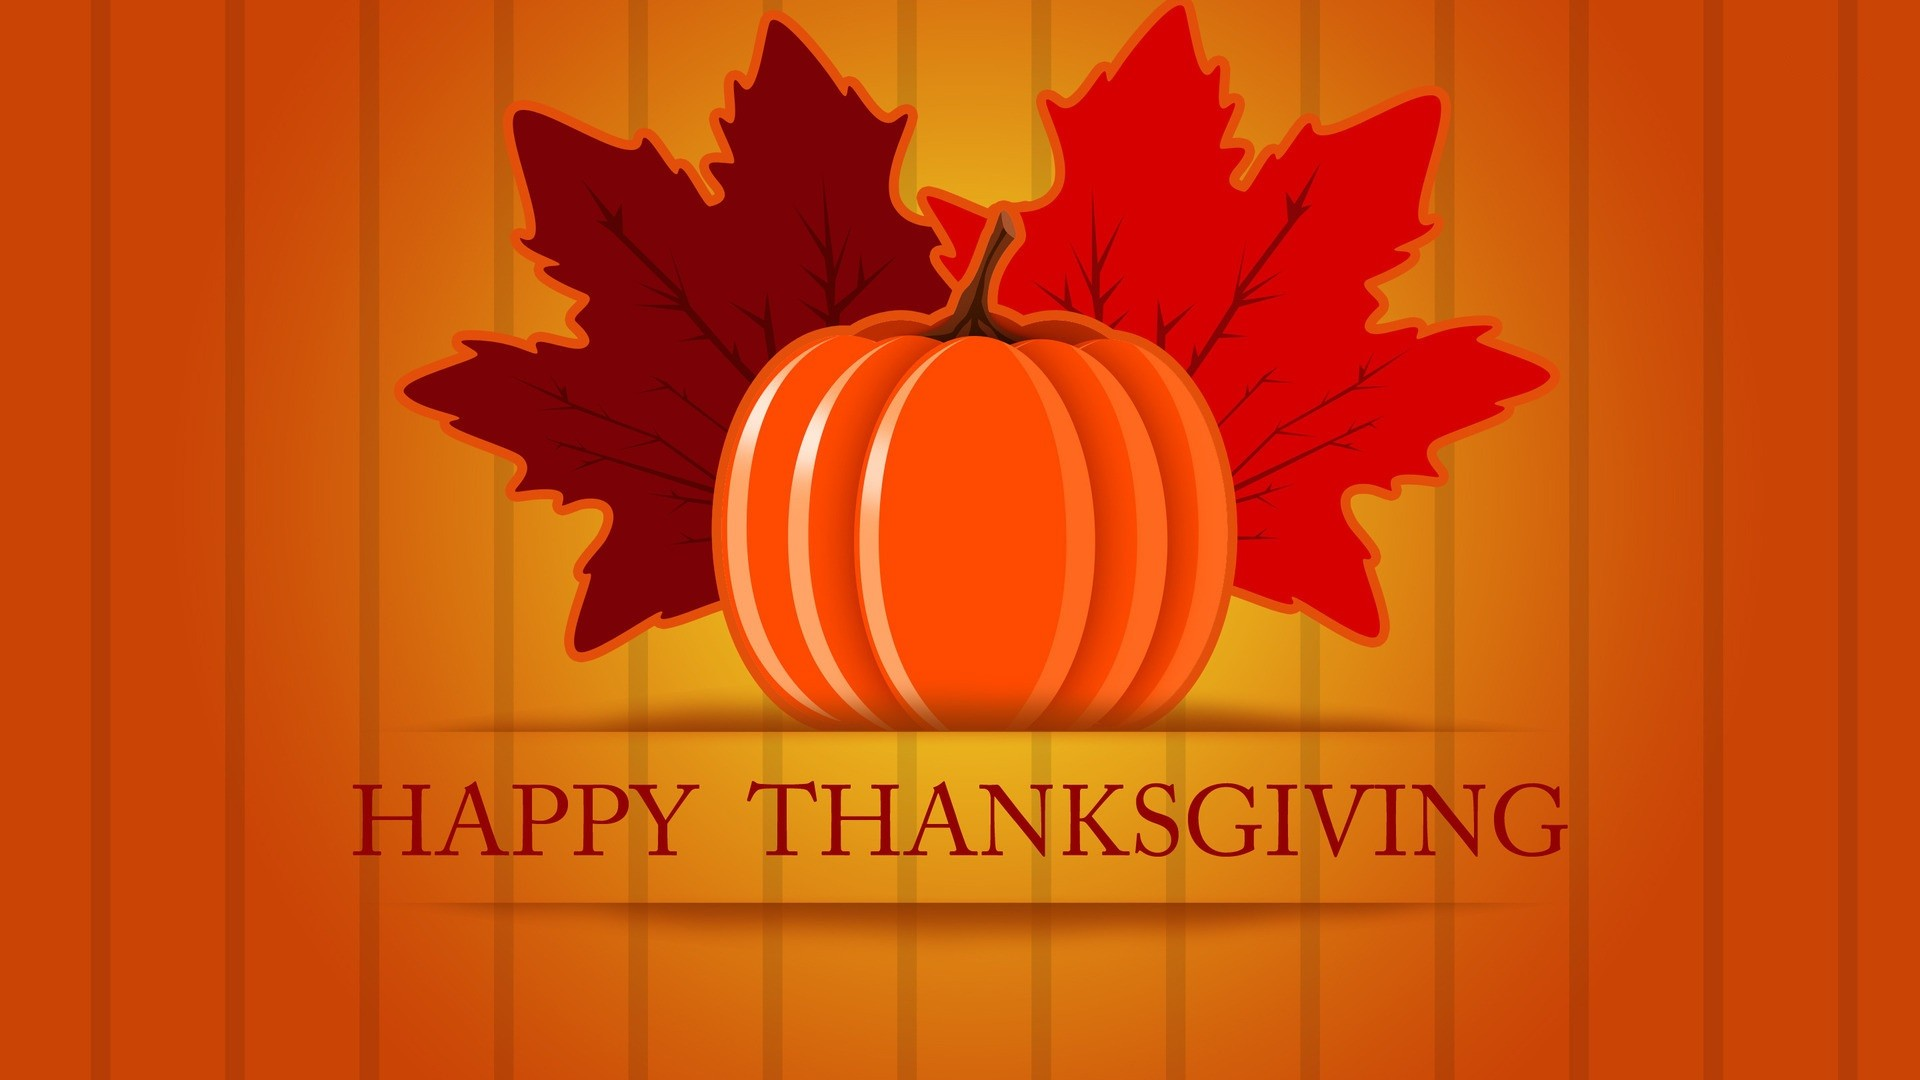 Thanksgiving Wallpaper: Live, Free, Desktop, Happy And Thanksgiving Snoopy  Wallpapers Wallpapers)